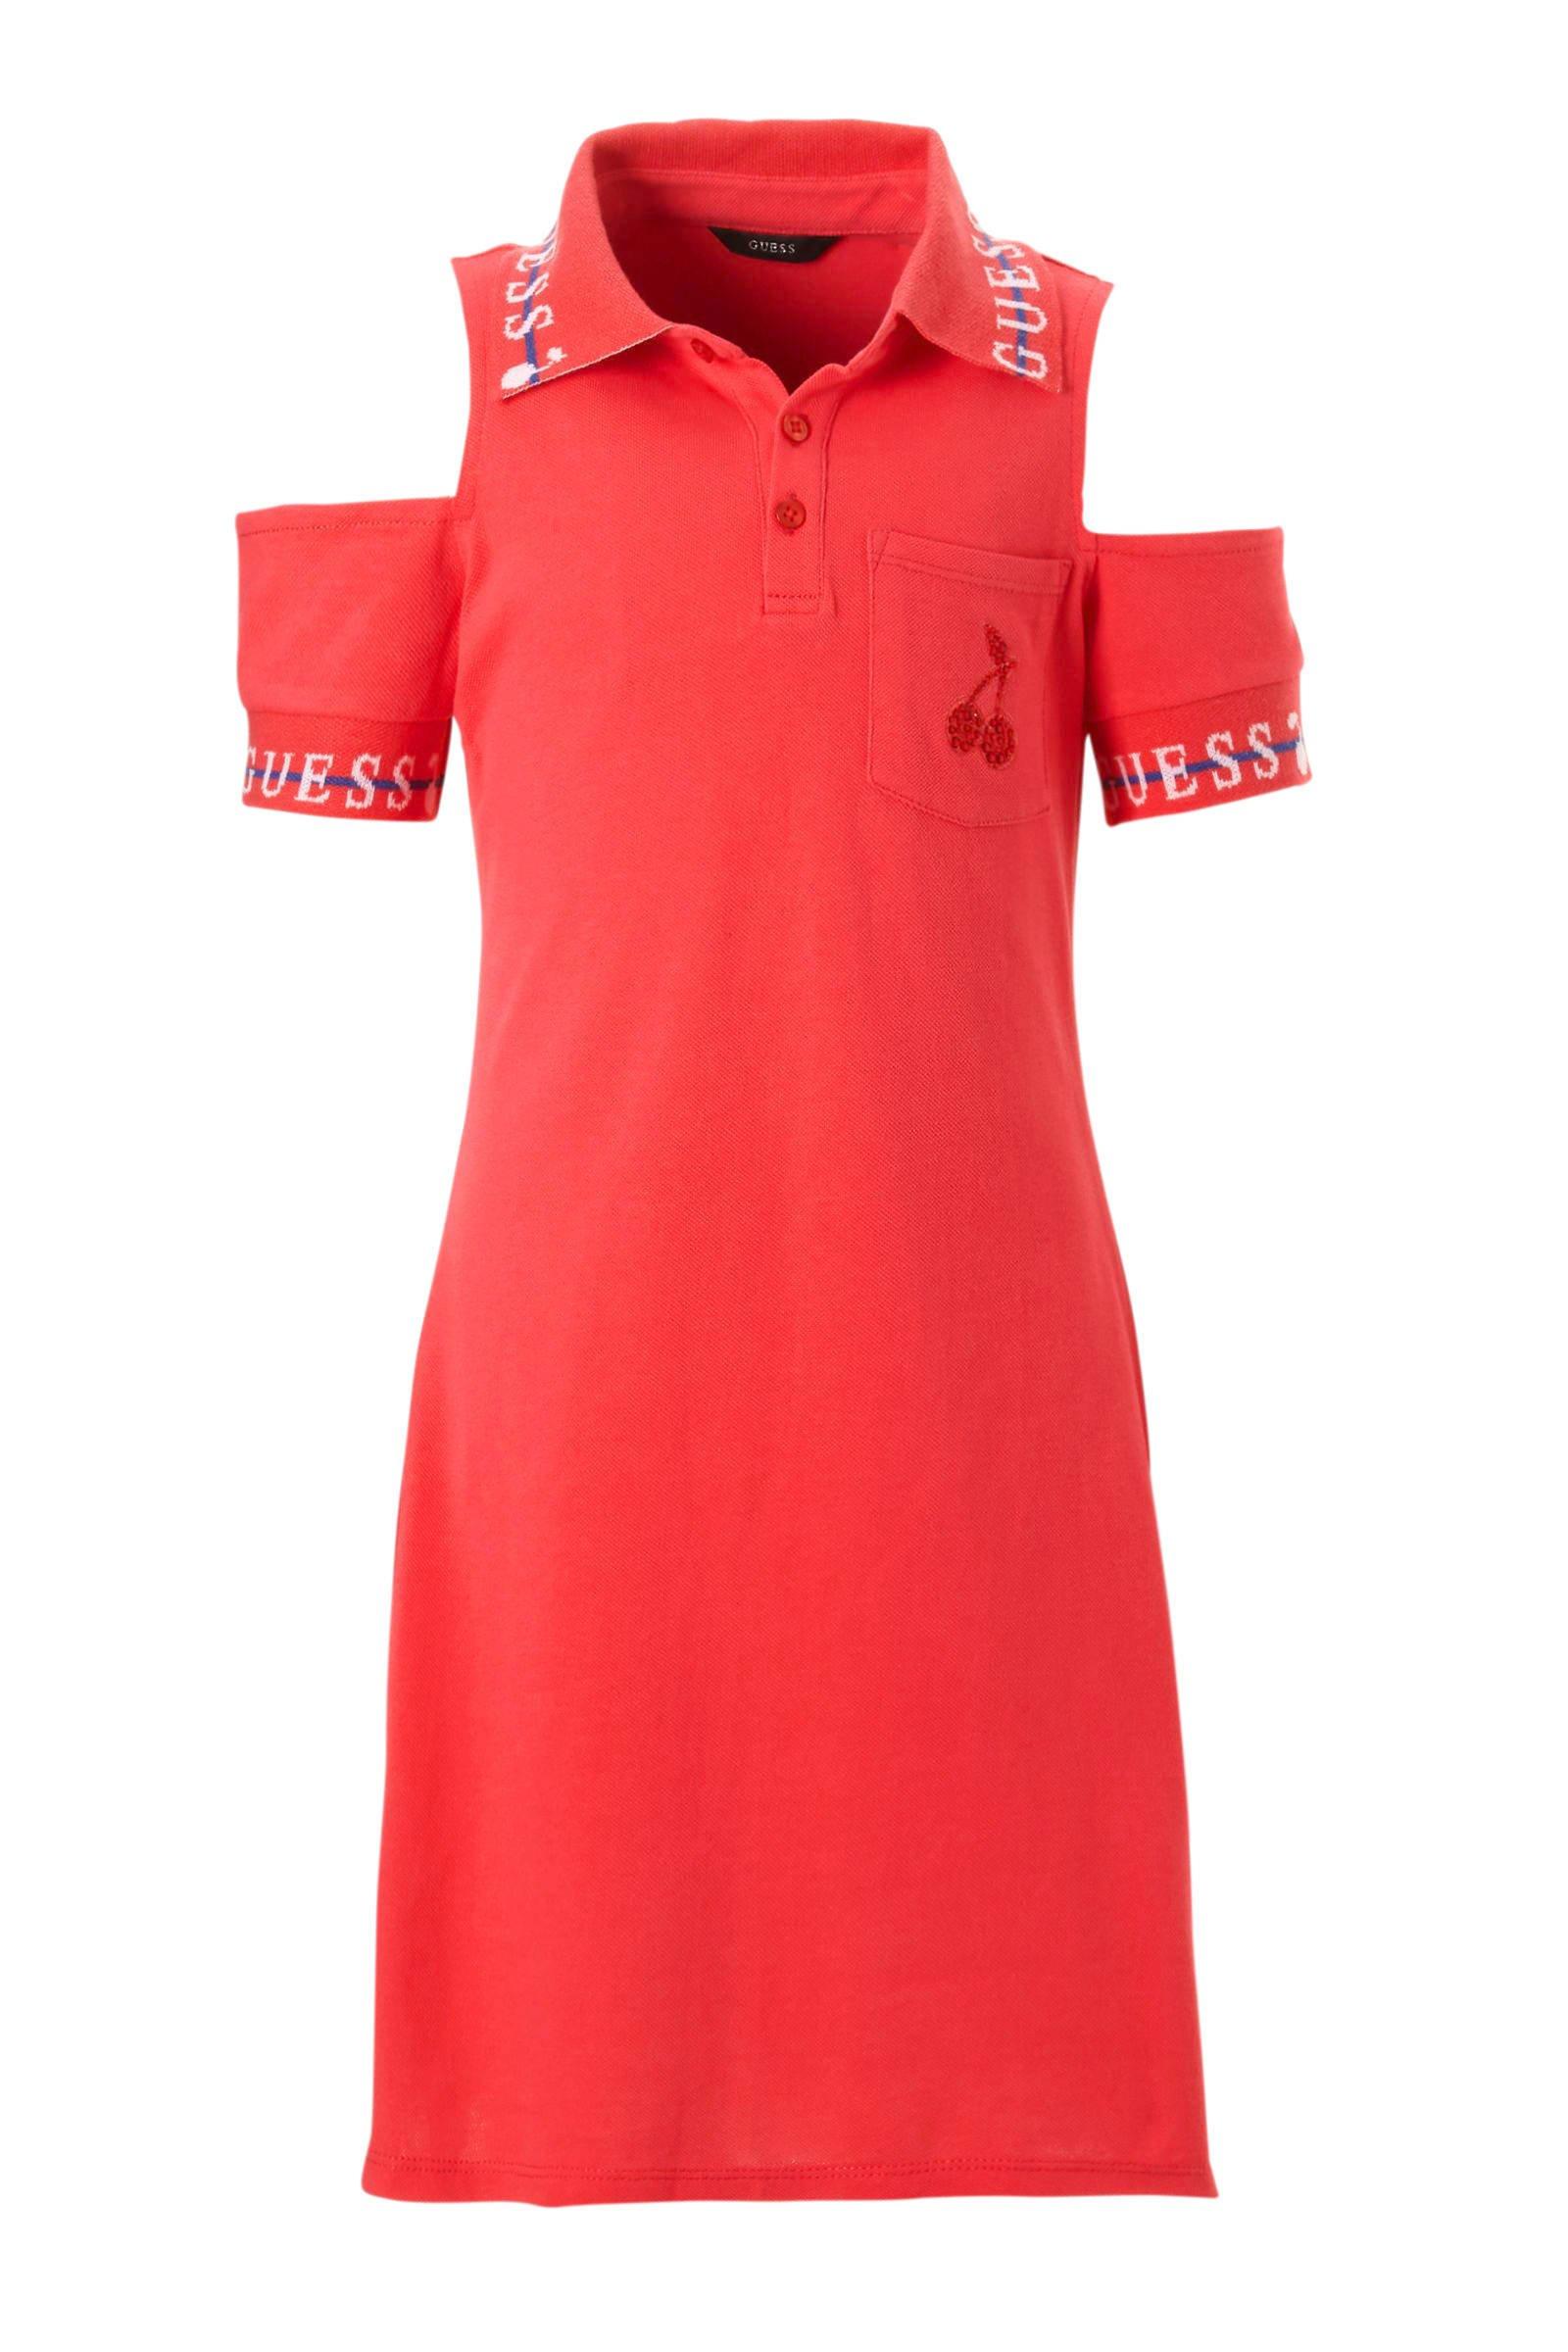 24a8aa6e14 guess-open-shoulder-jurk-met-tekst-rood-rood-7613402868333.jpg